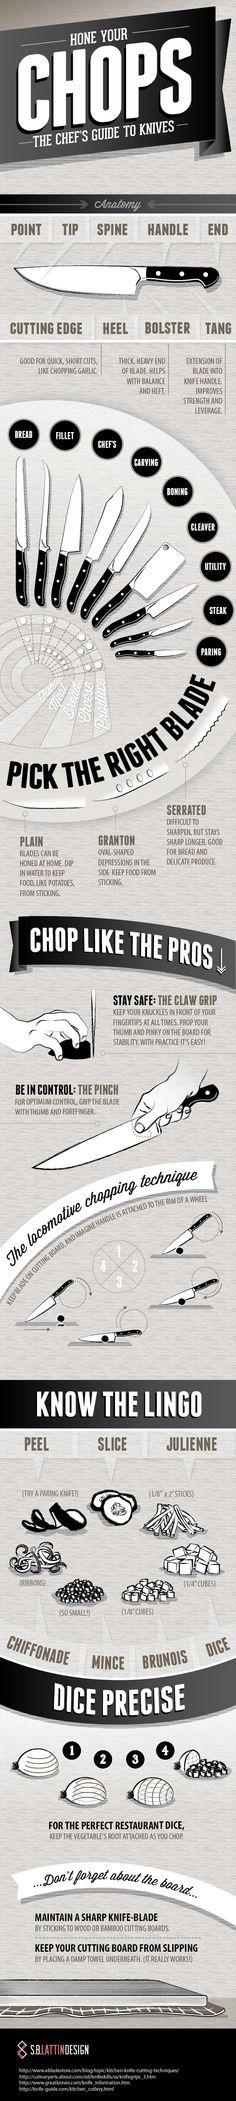 Tutorial de cuchillos